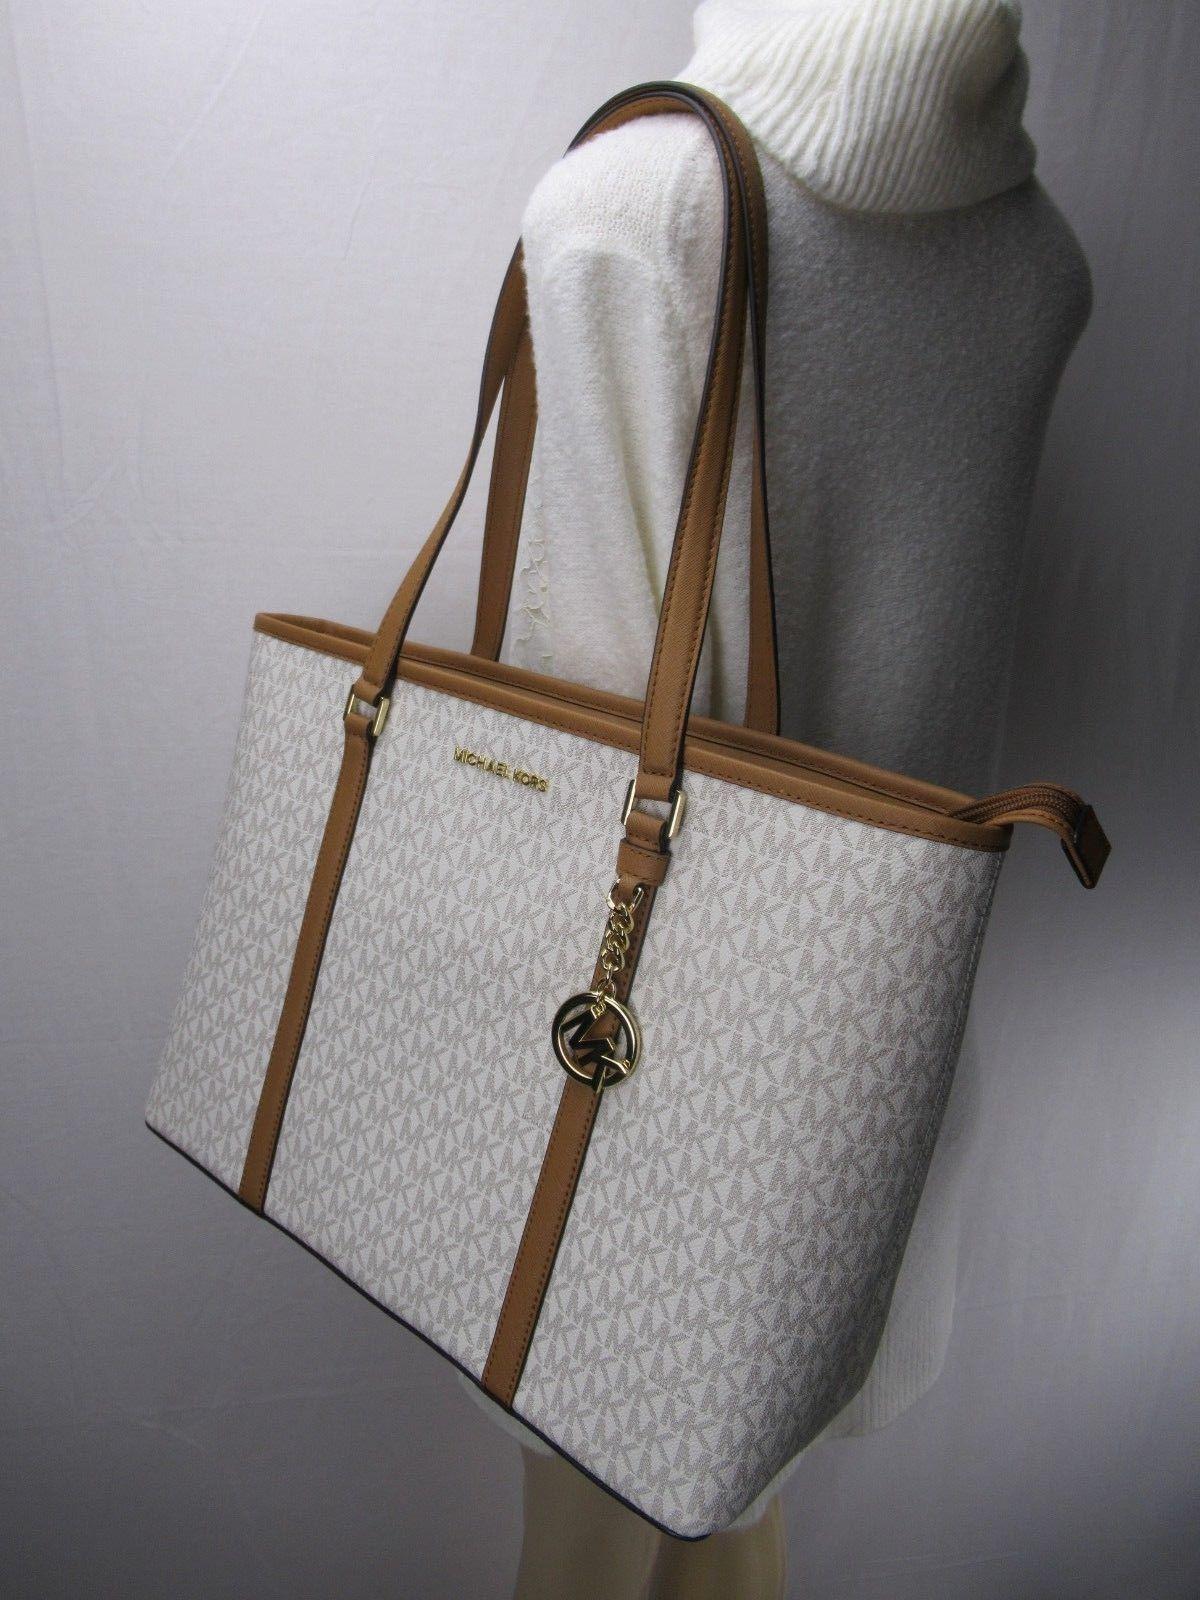 67e012ee1713 NWT Michael Kors PVC Sady Vanilla Large Weekender Travel Tote Bag Laptop -   195.00